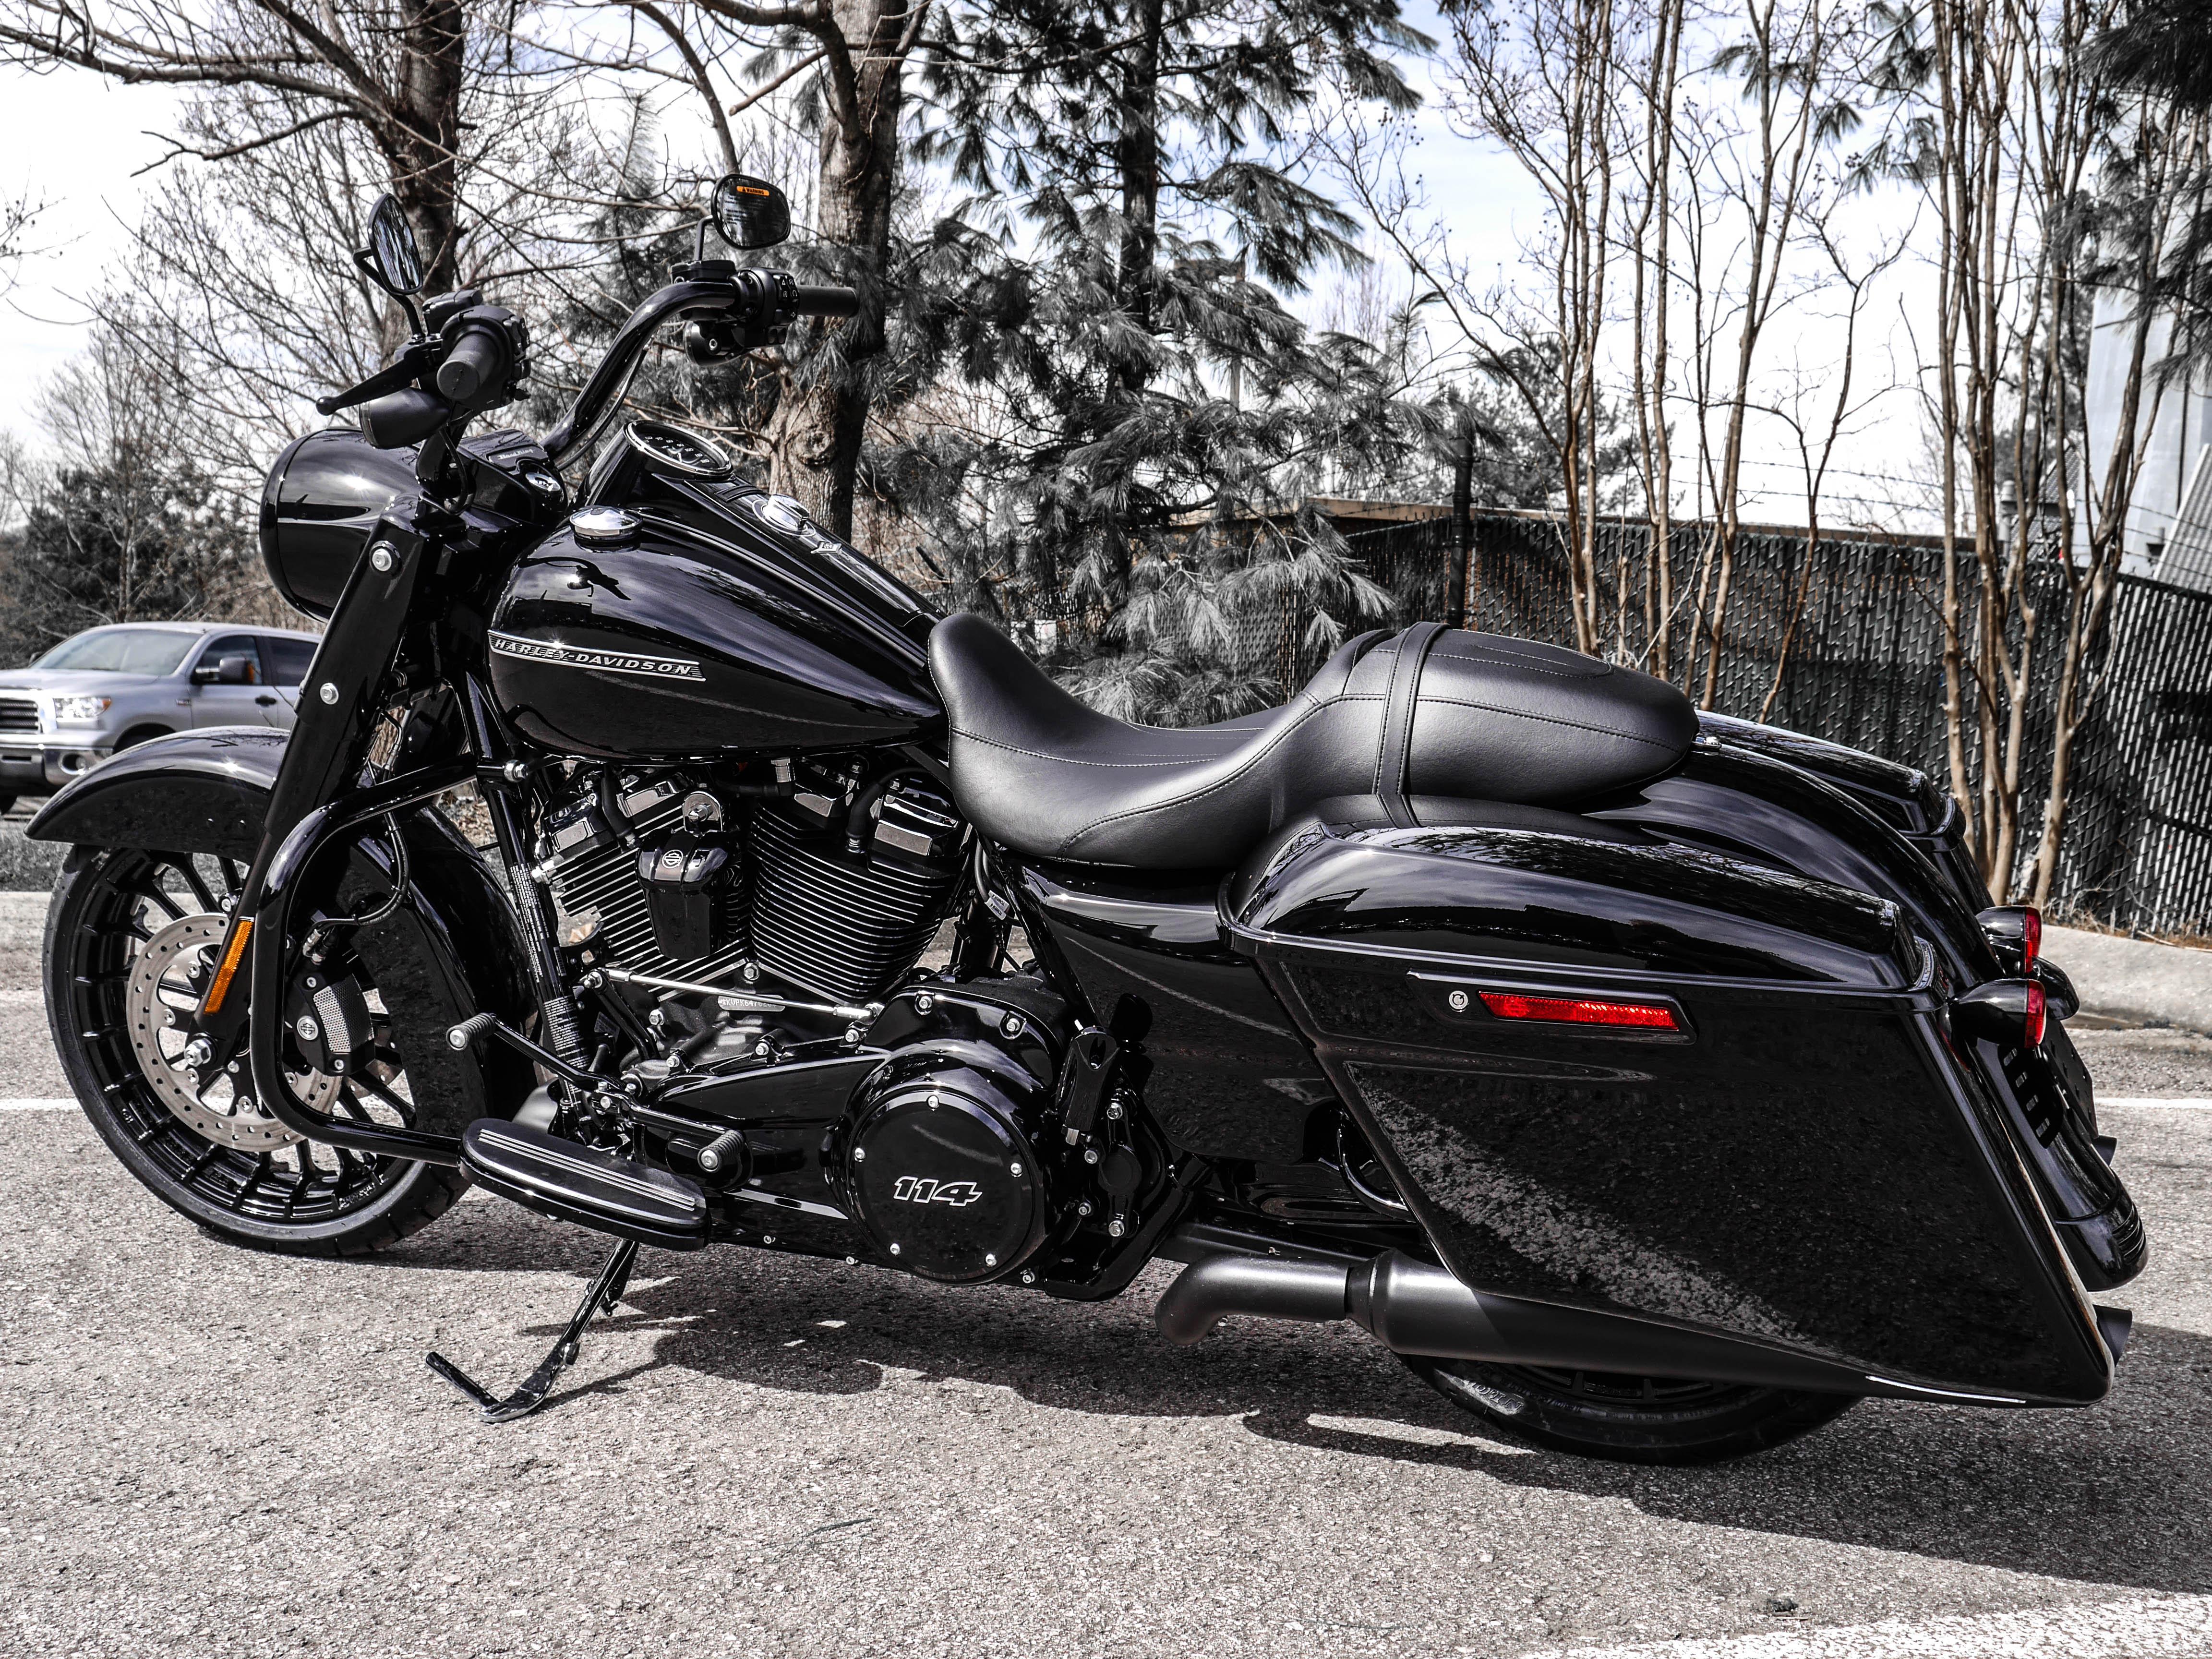 New 2019 Harley-Davidson Special